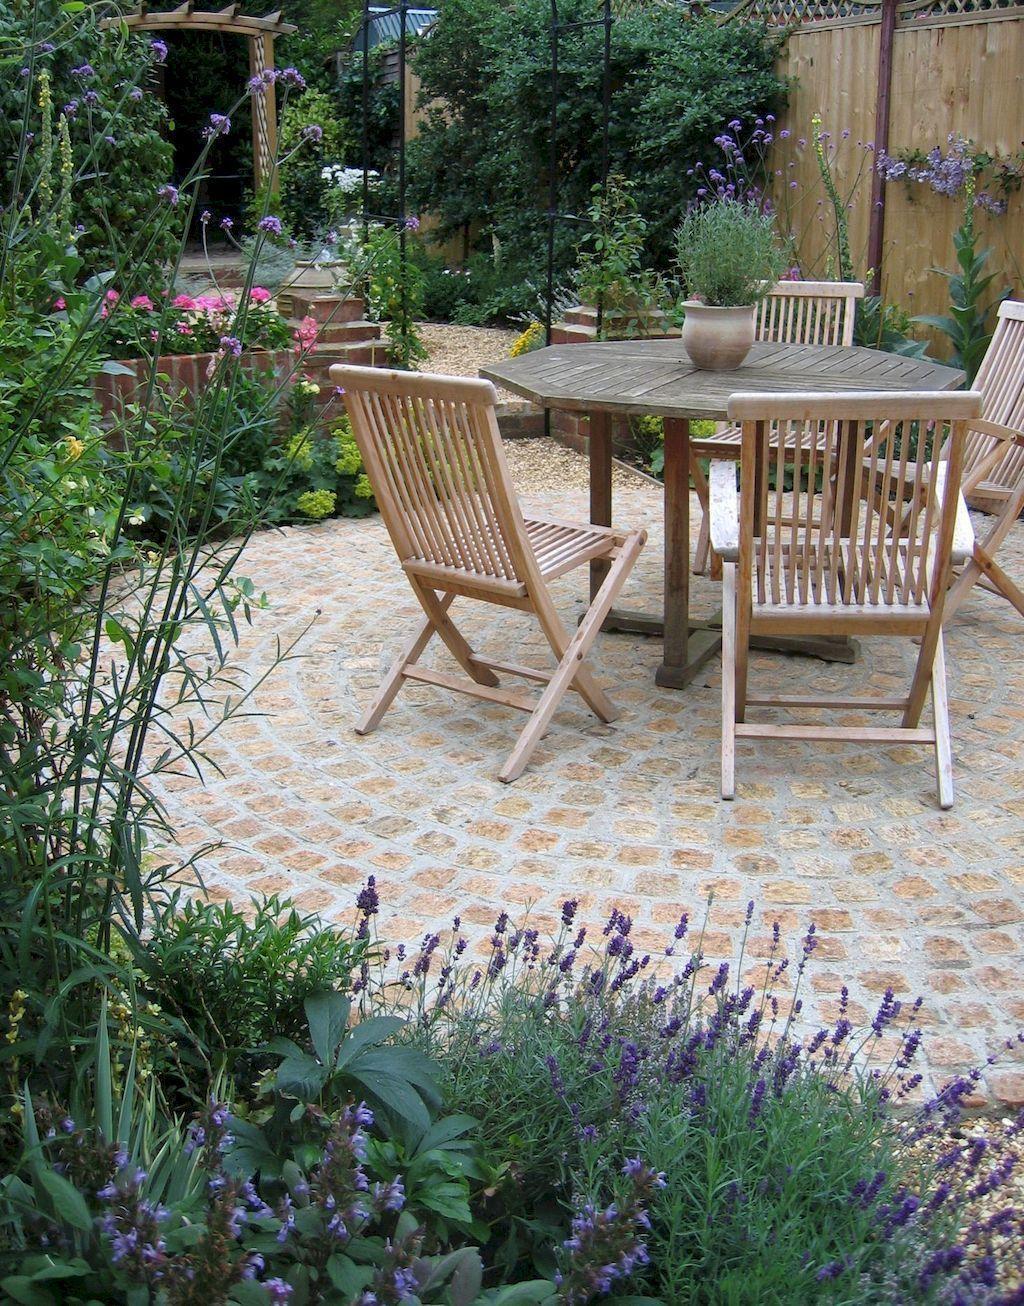 37 beautiful small cottage garden ideas for backyard inspiration #smallgardenideas